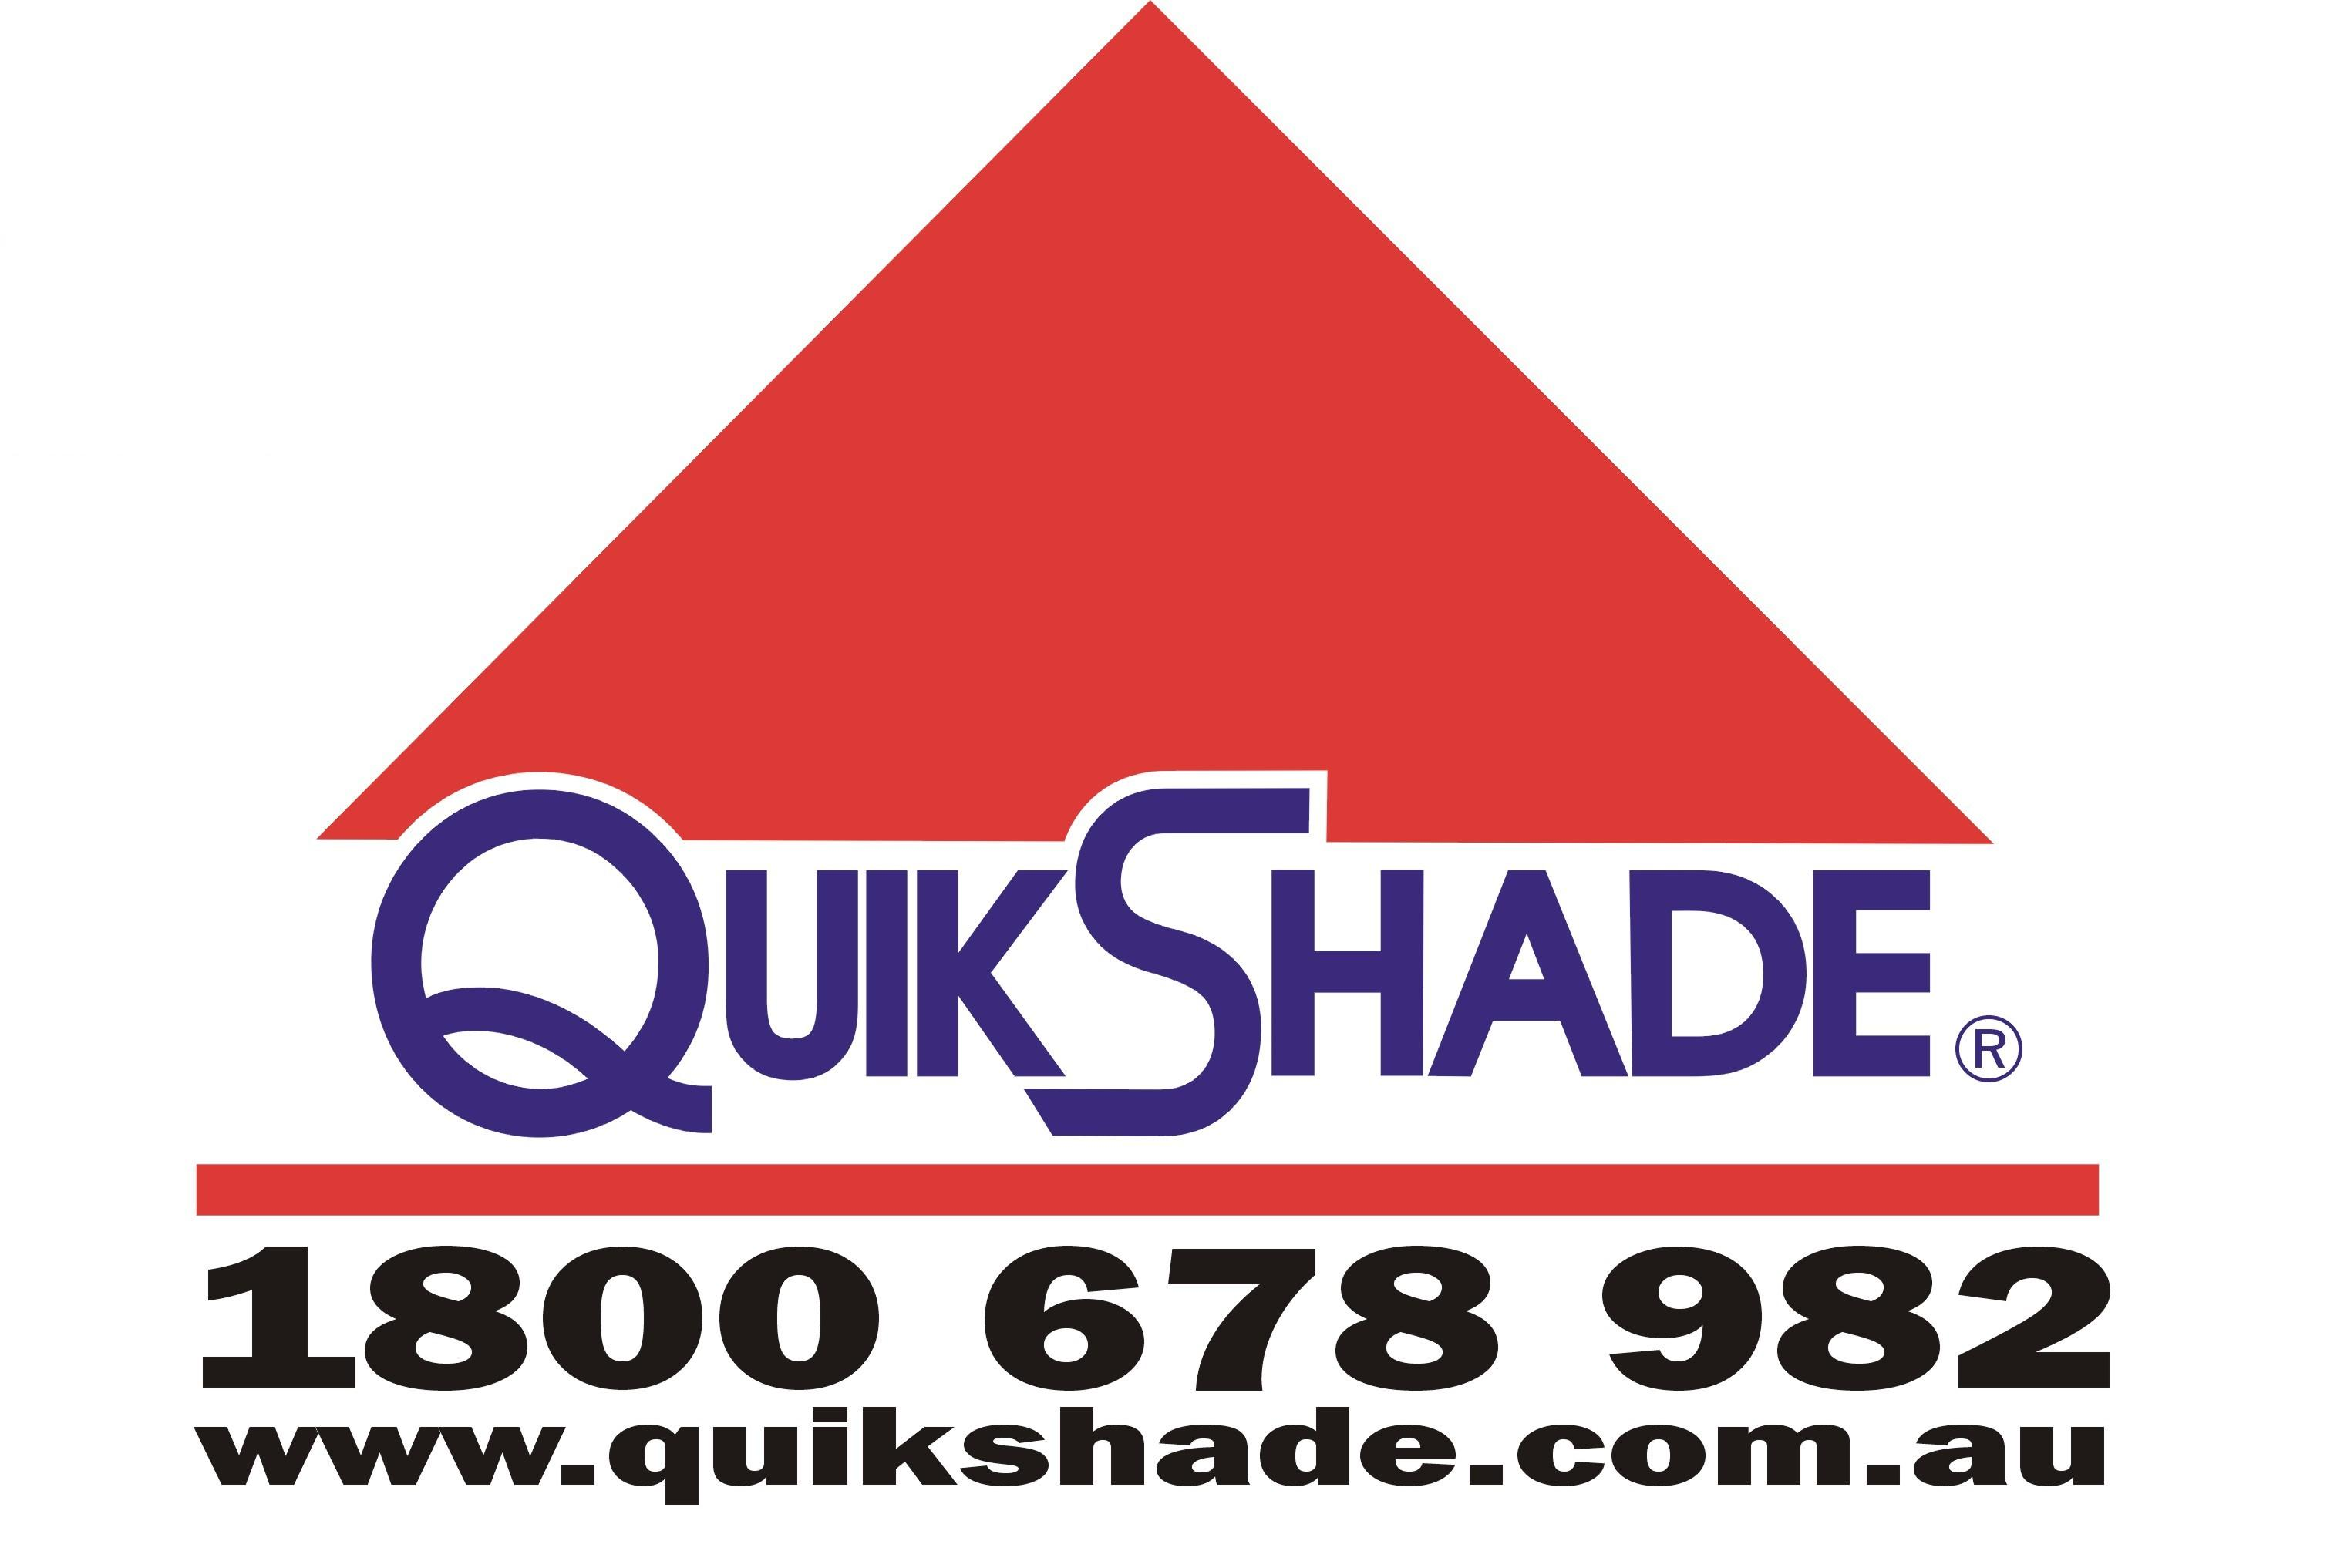 Quikshade Australia - The Australian Made Campaign